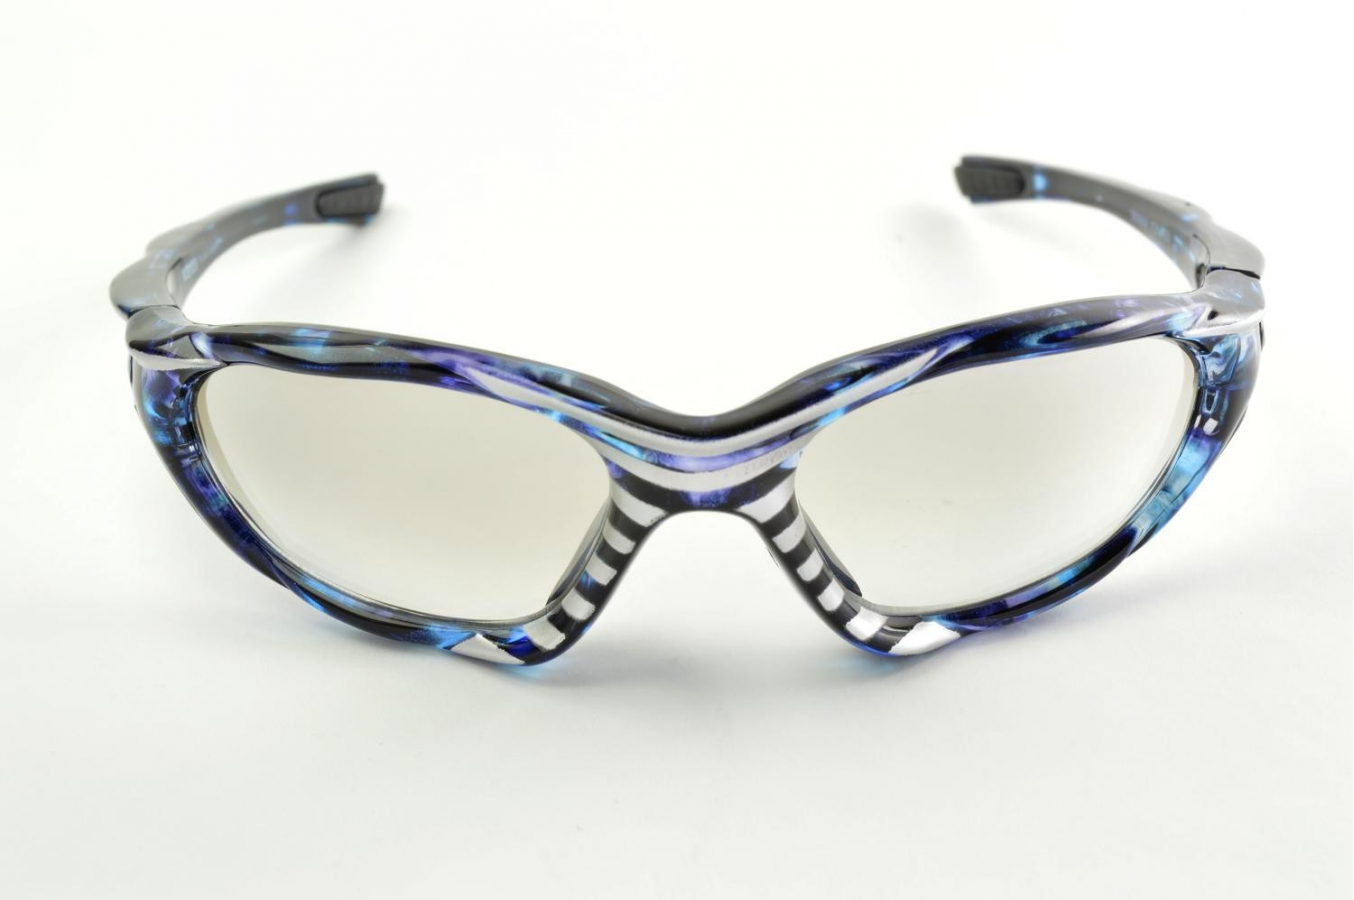 lunettes de soleil sport rayures frontales verres miroirs k eyes. Black Bedroom Furniture Sets. Home Design Ideas